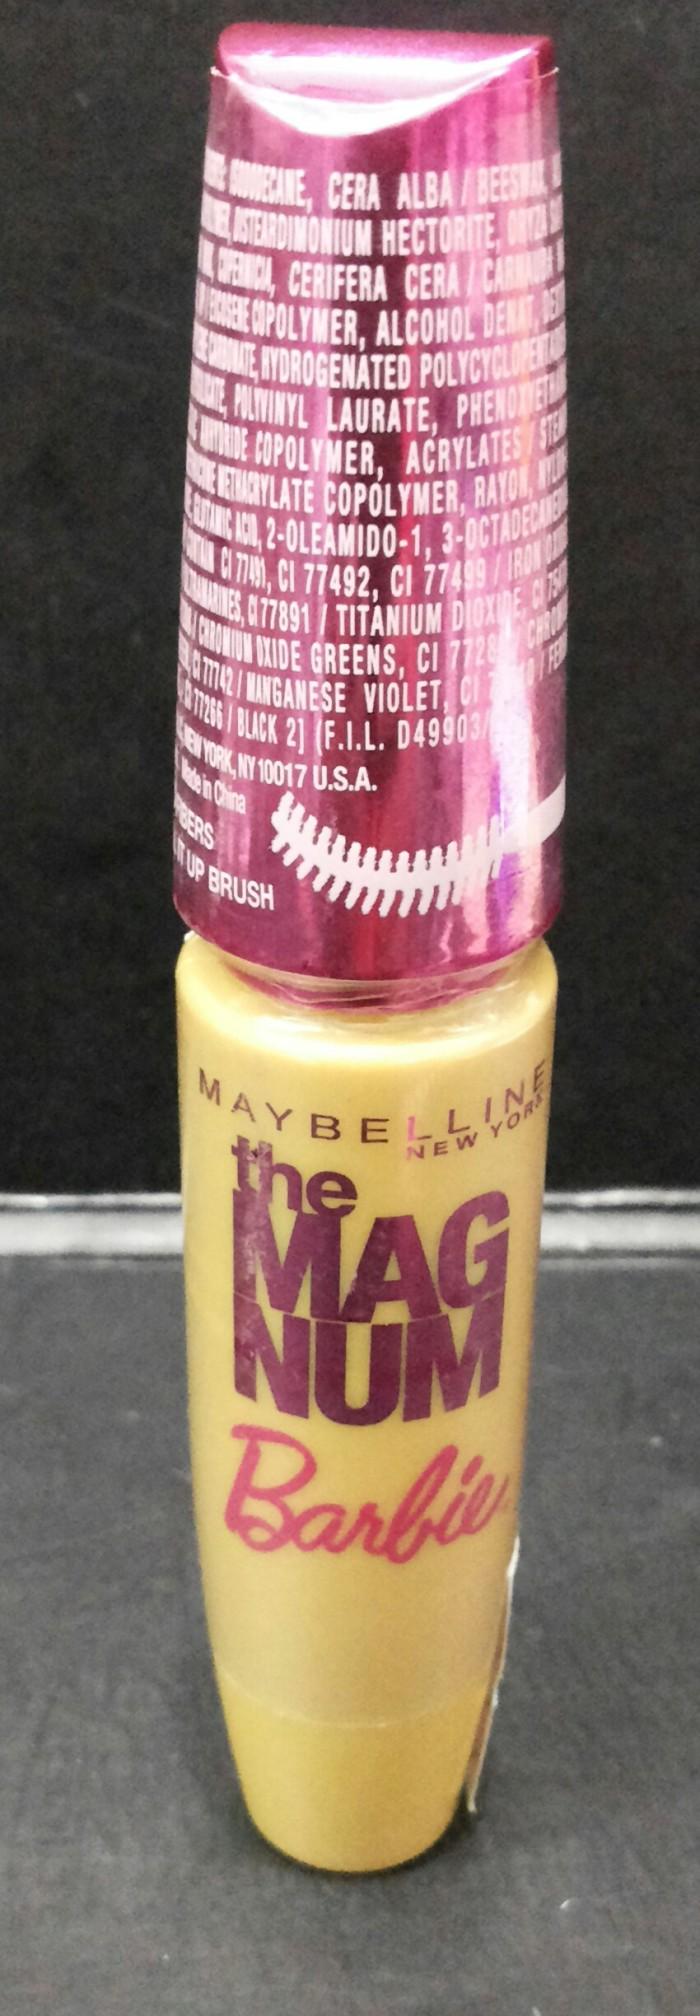 Jual Maybelline Magnum Barbie Mascara Maskara Ori 100